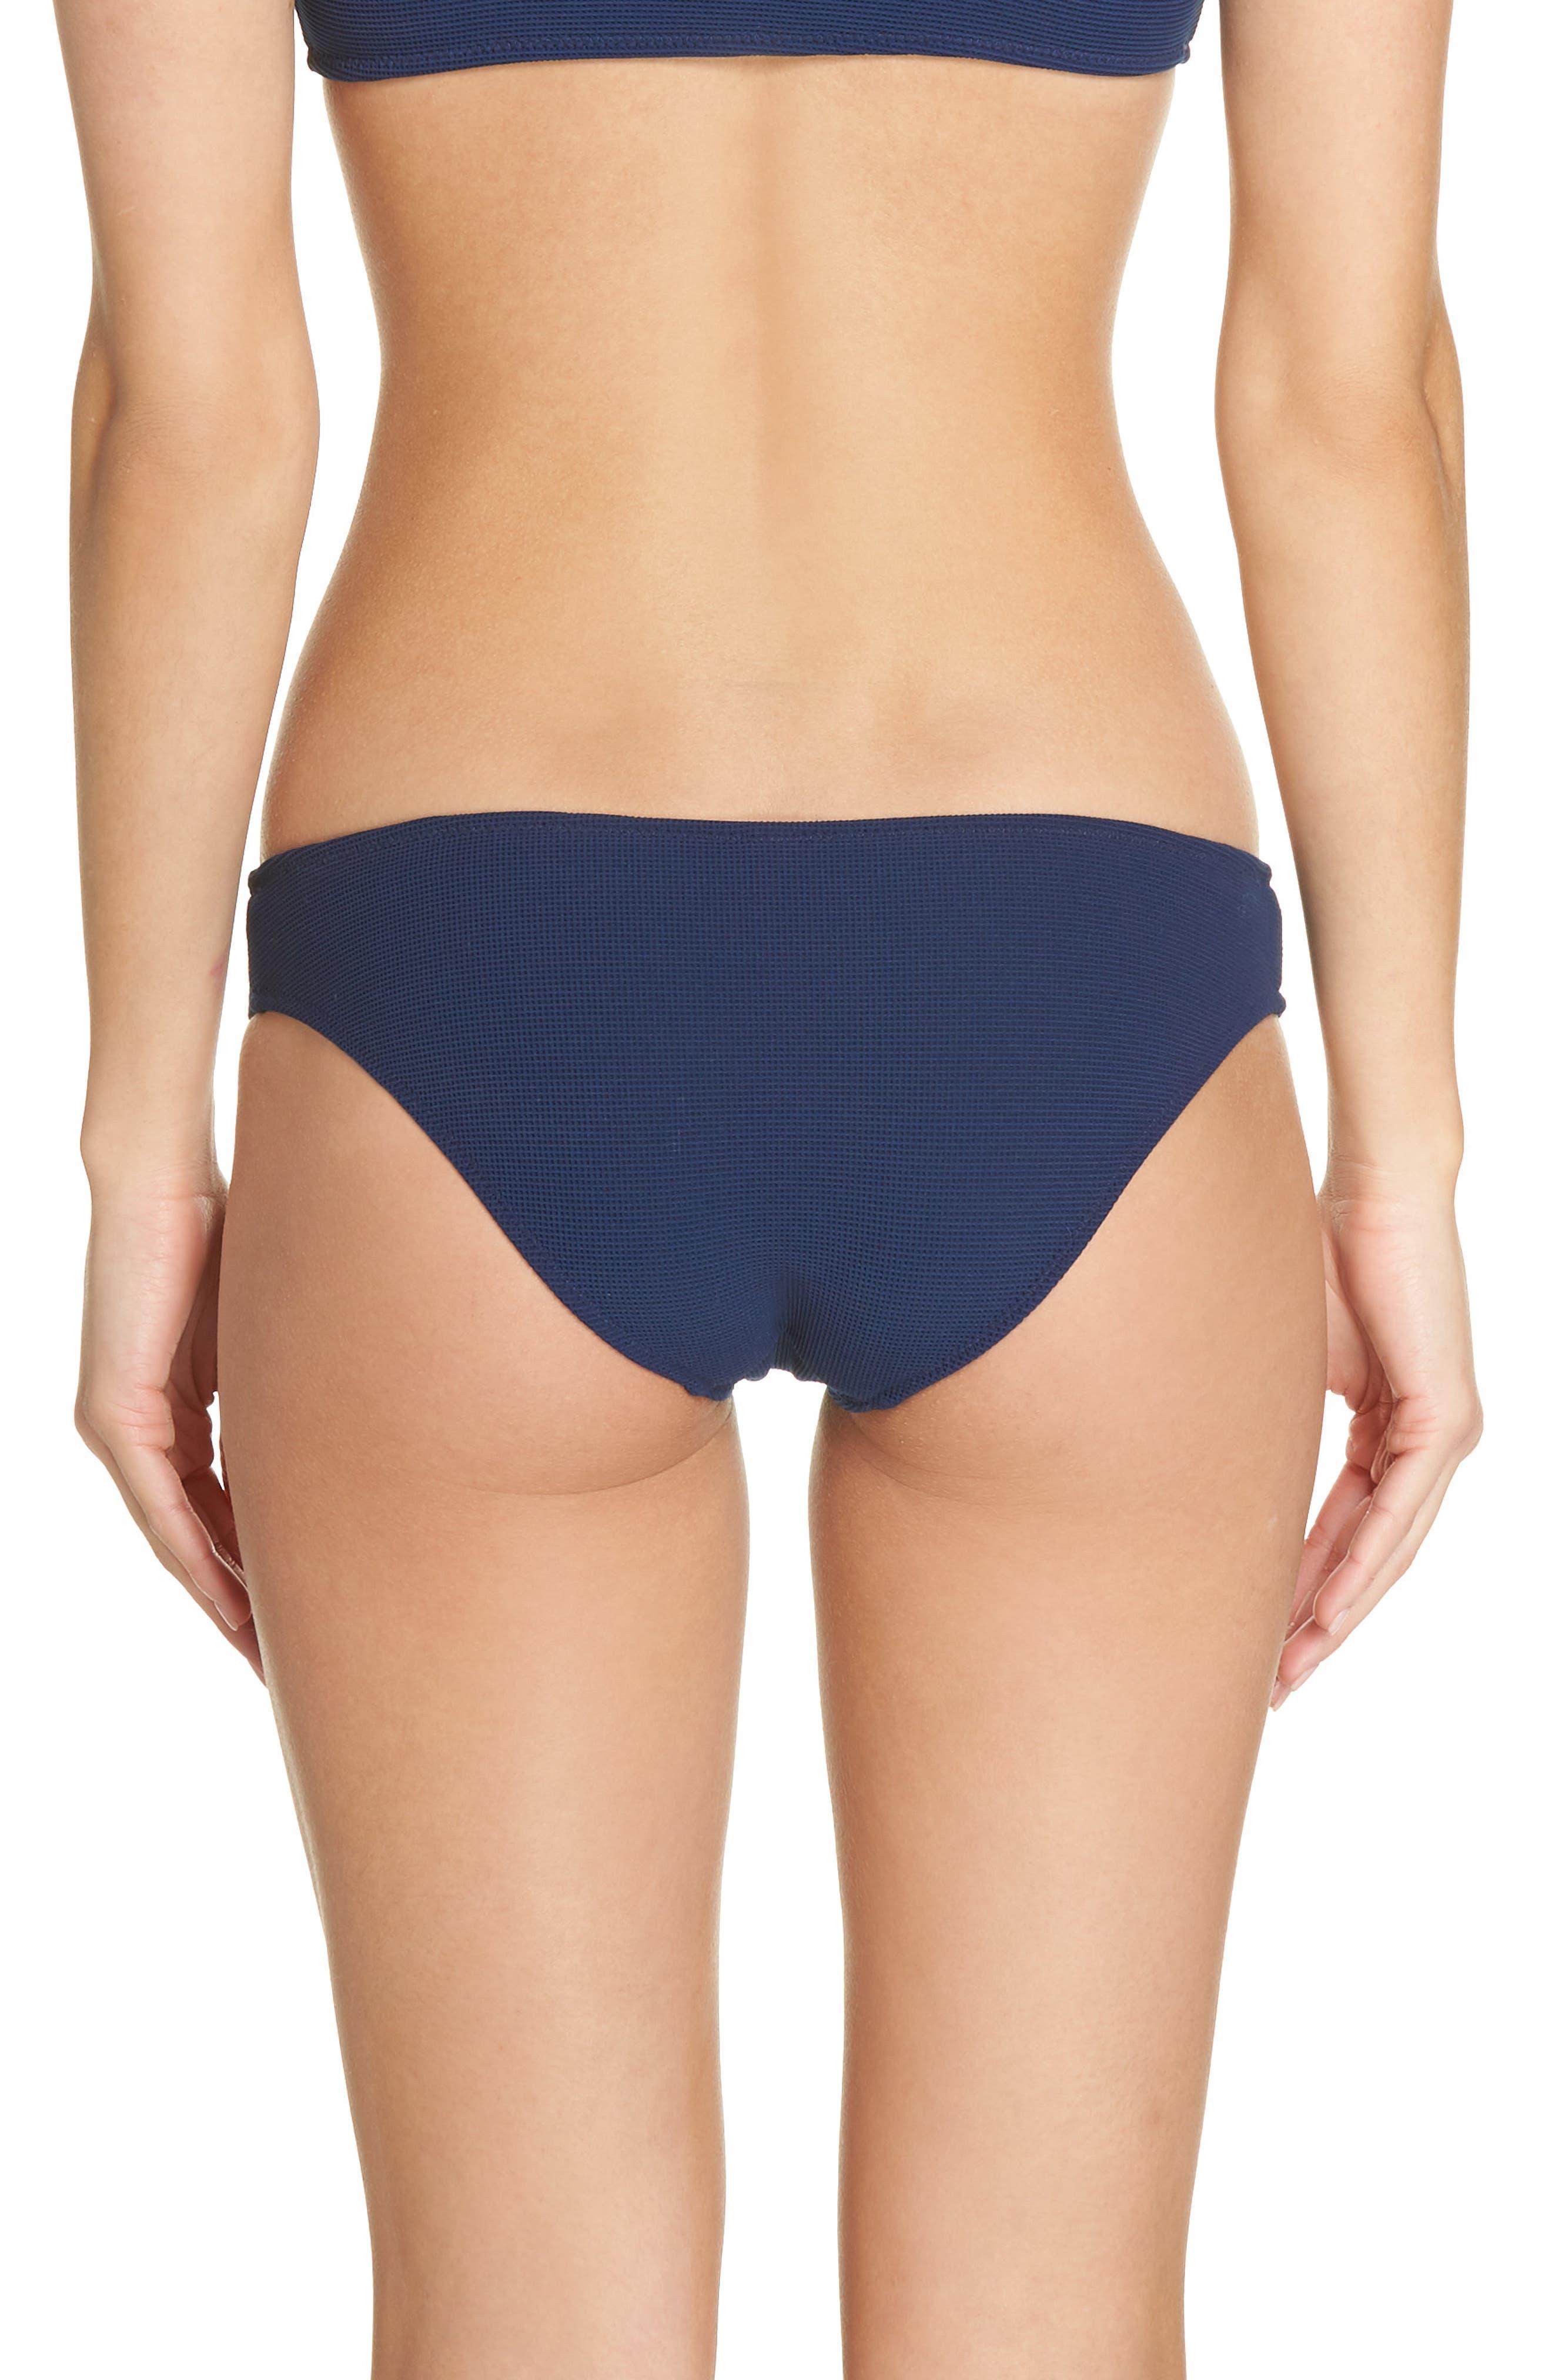 Elle Bikini Bottoms,                             Alternate thumbnail 2, color,                             NAVY PIQUE